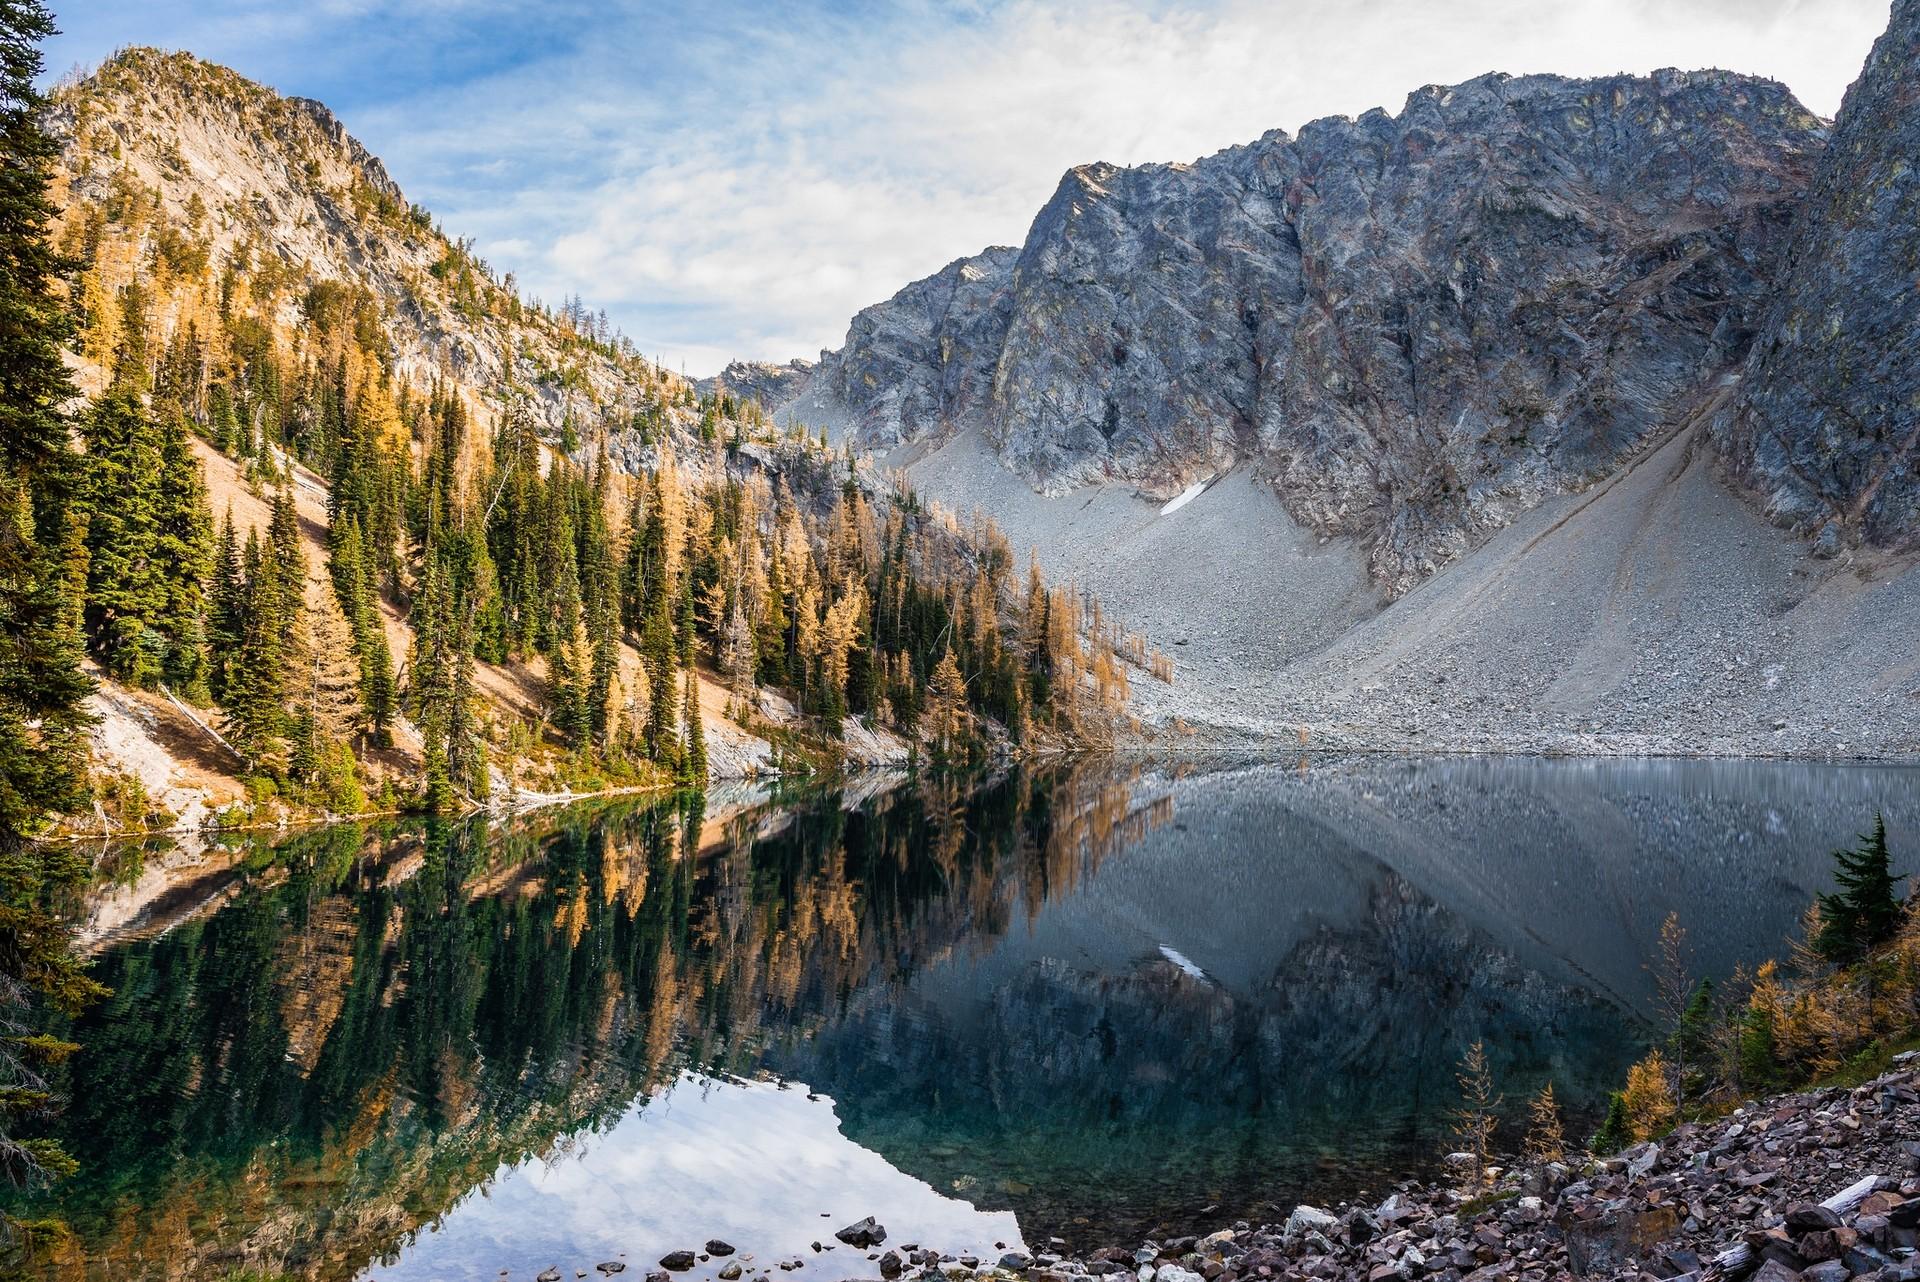 General 1920x1282 landscape nature North Cascades National Park Washington lake